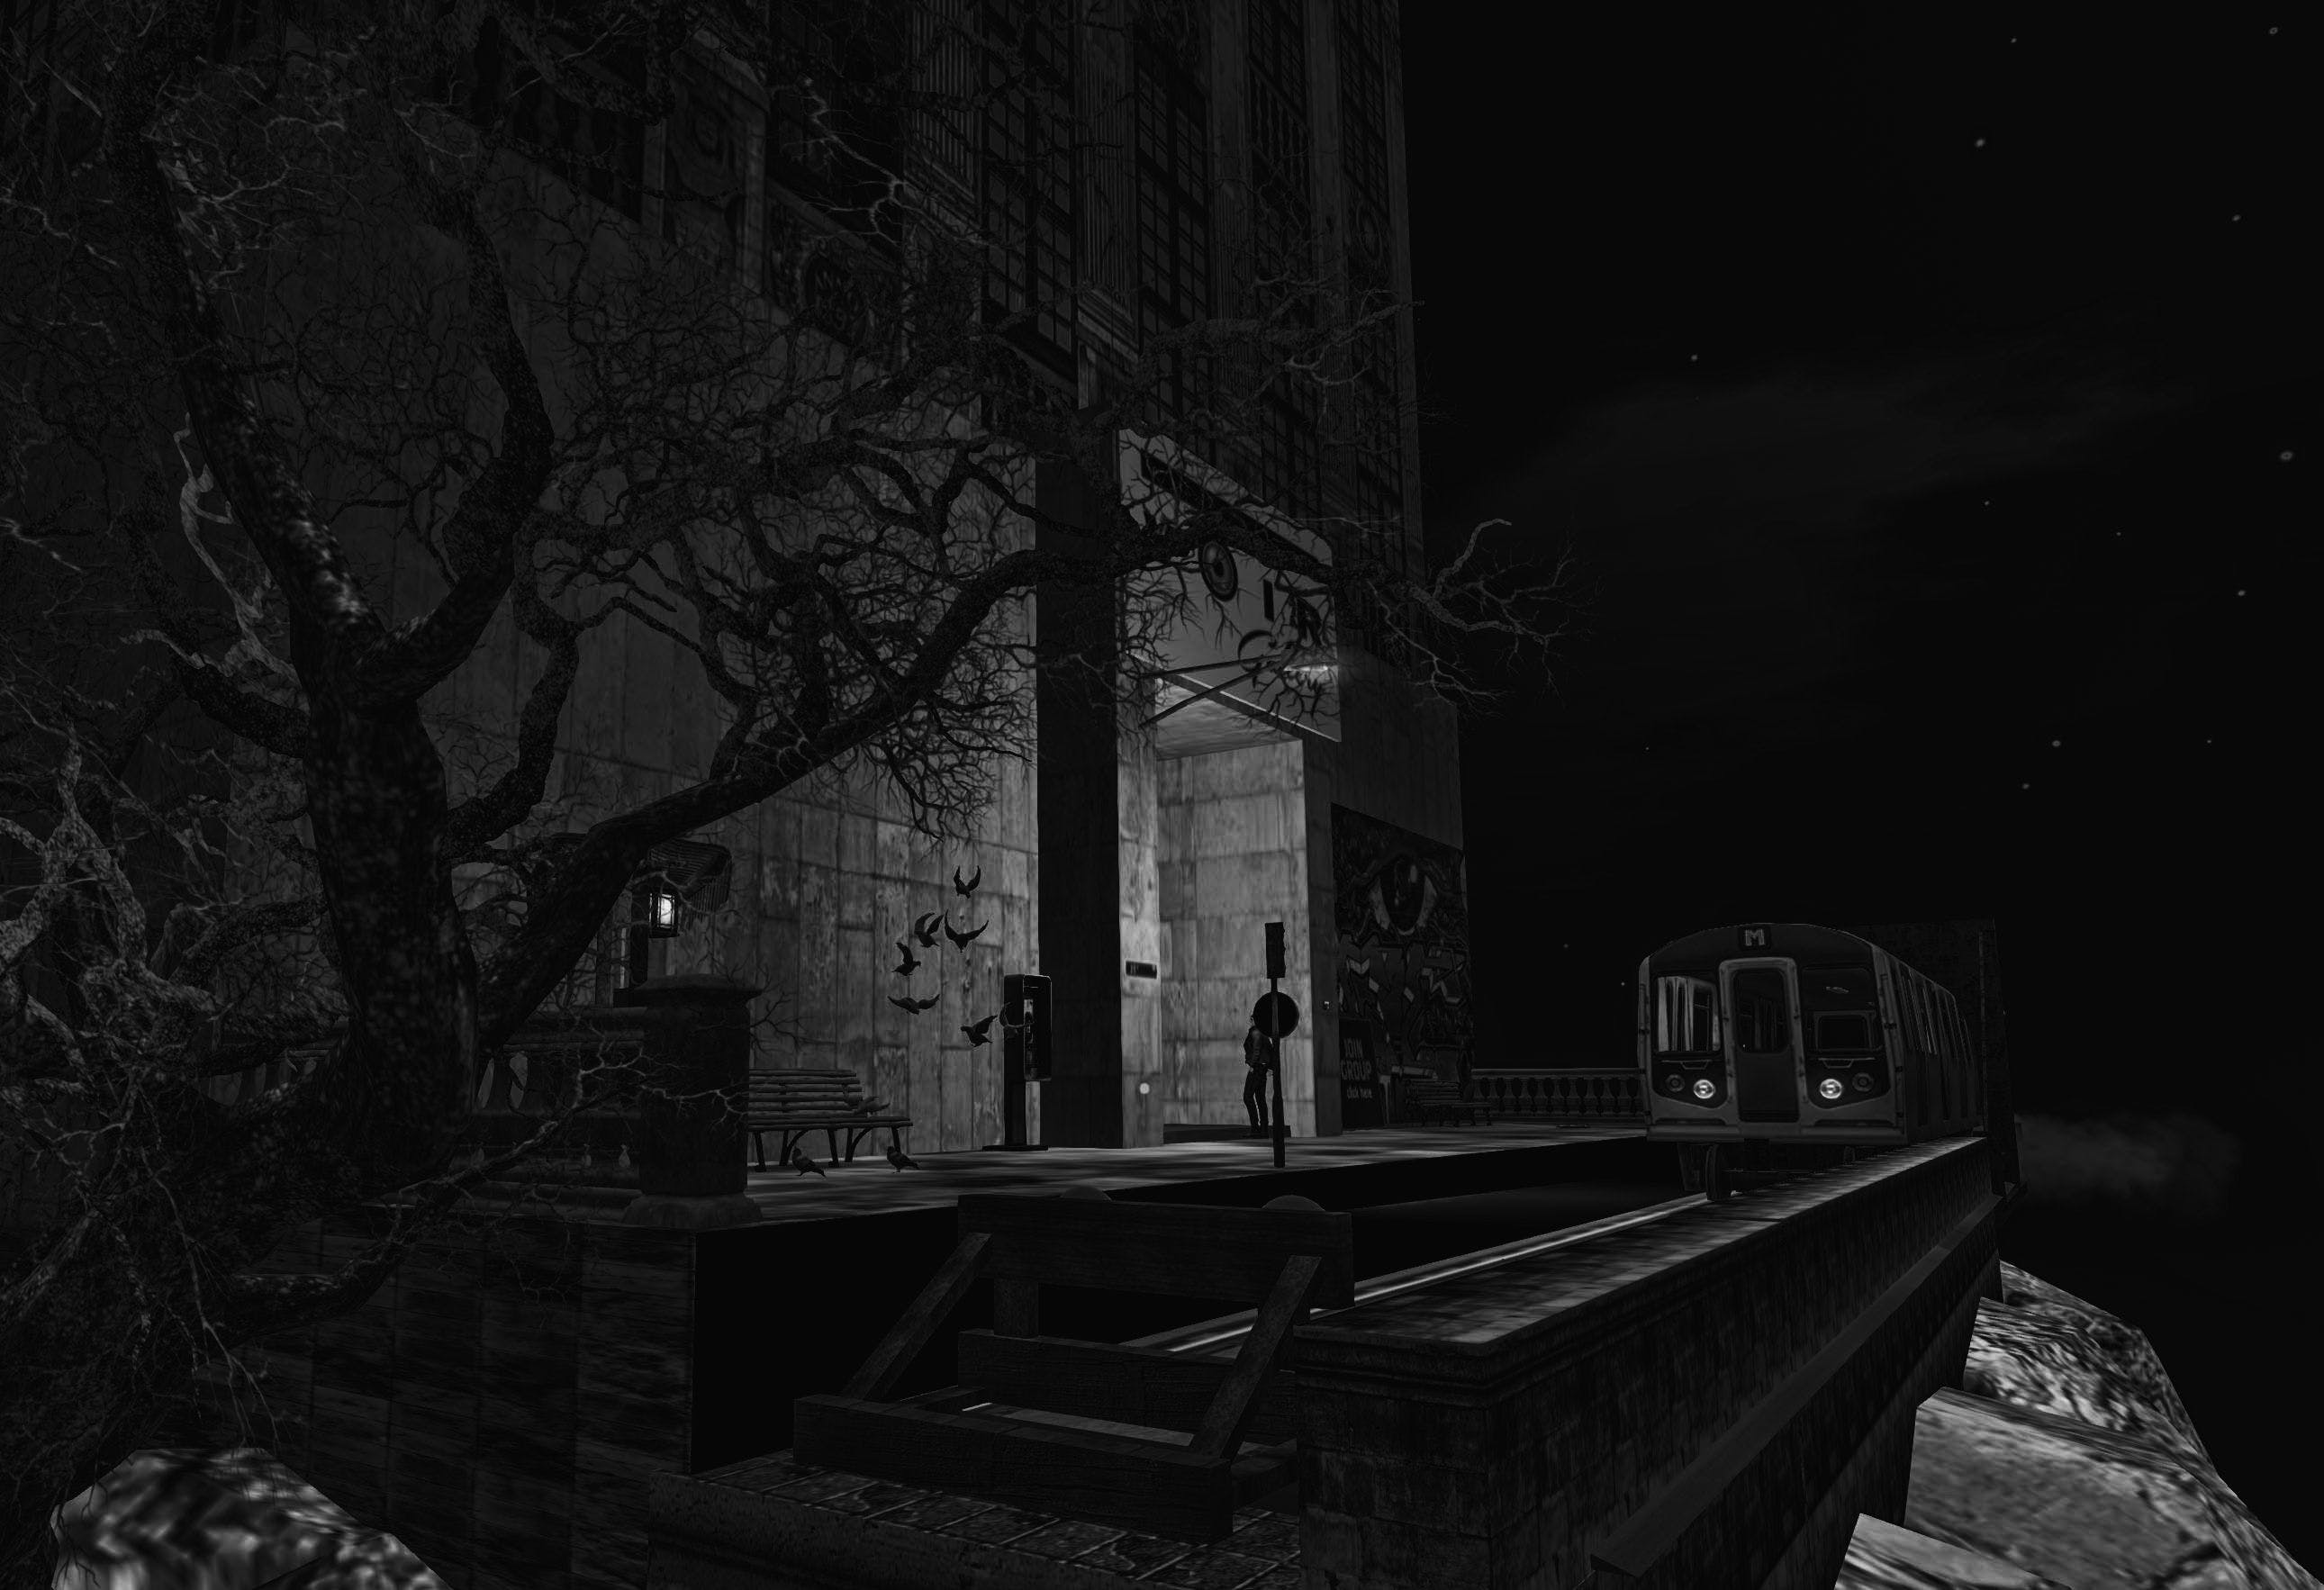 Free stock photo of Metro stop